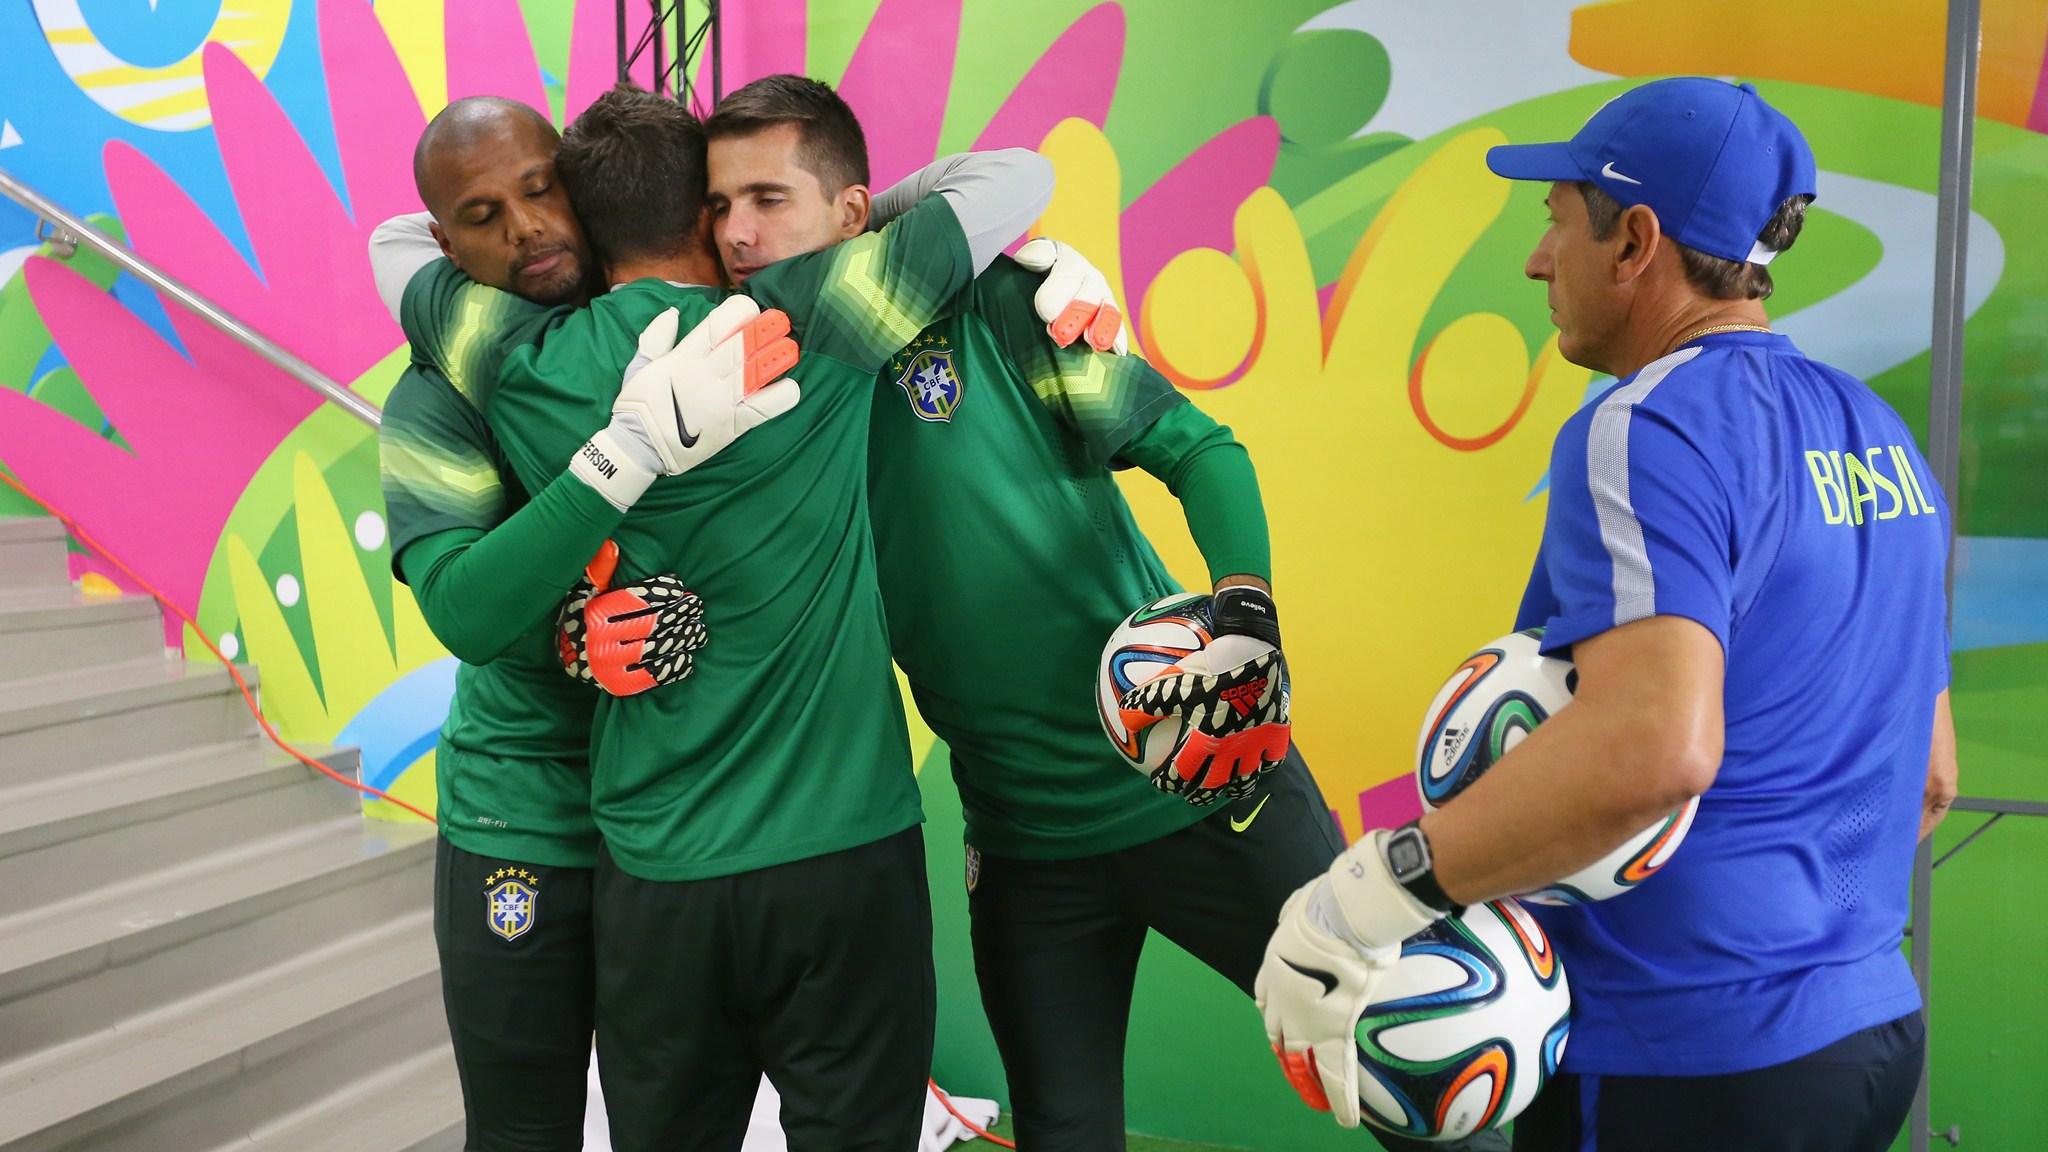 218 - Brazil-Colombia [2-1] -- 04 Jul 2014 - 17-00 - kuaza